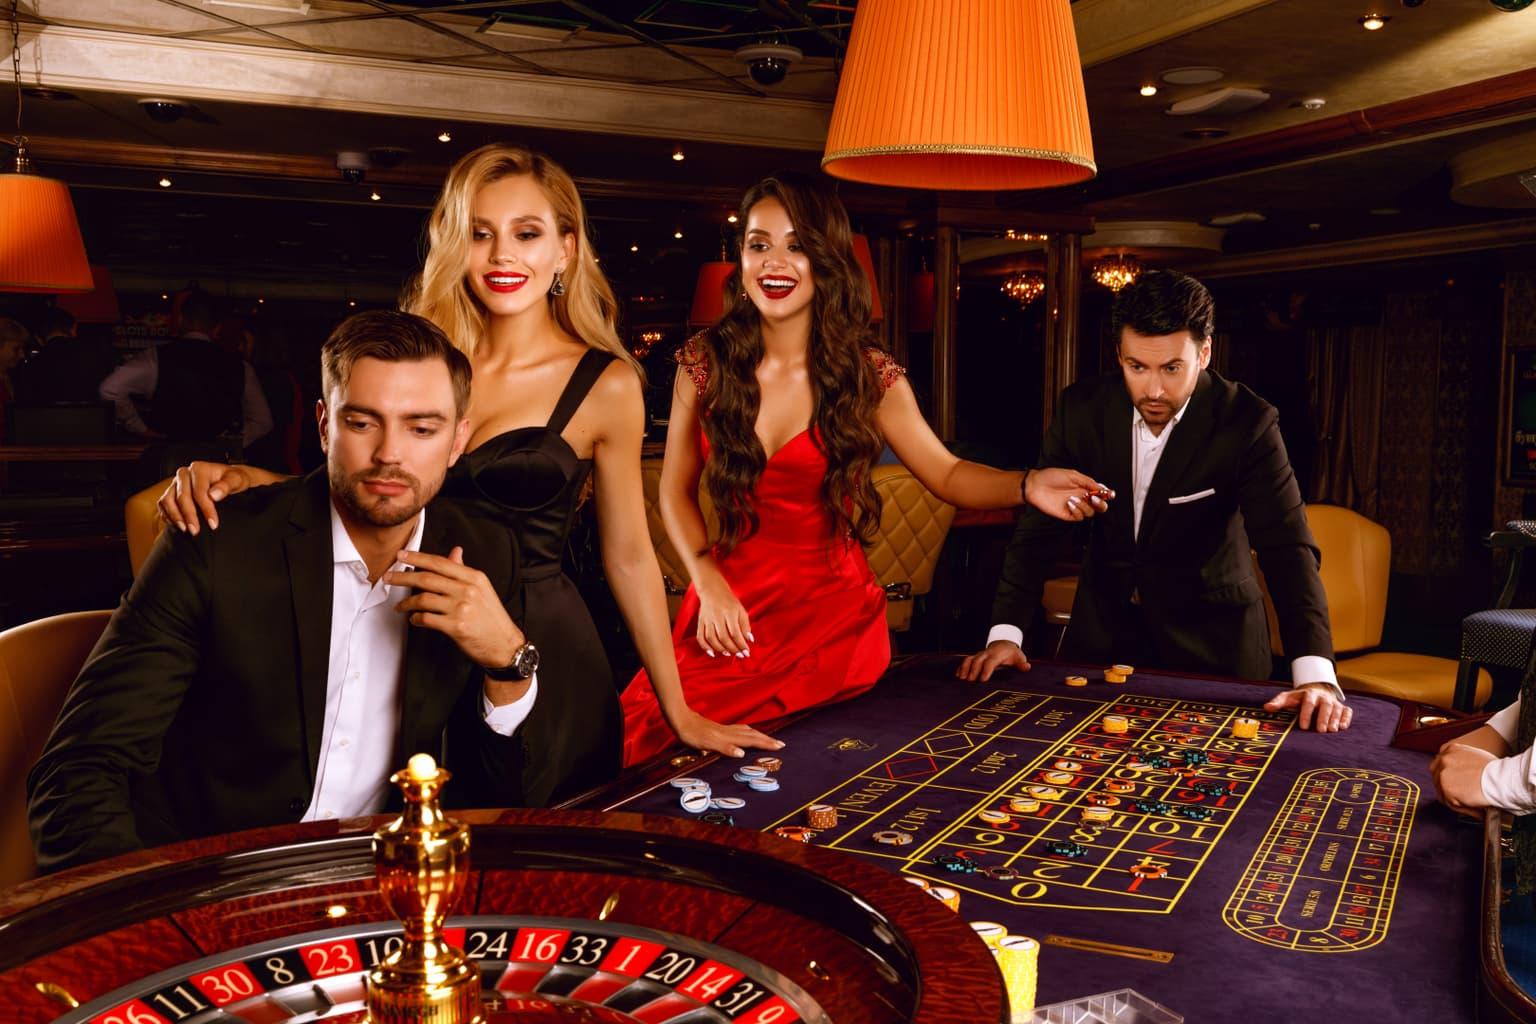 Кто играл в казино в минске casino online for free app play casino